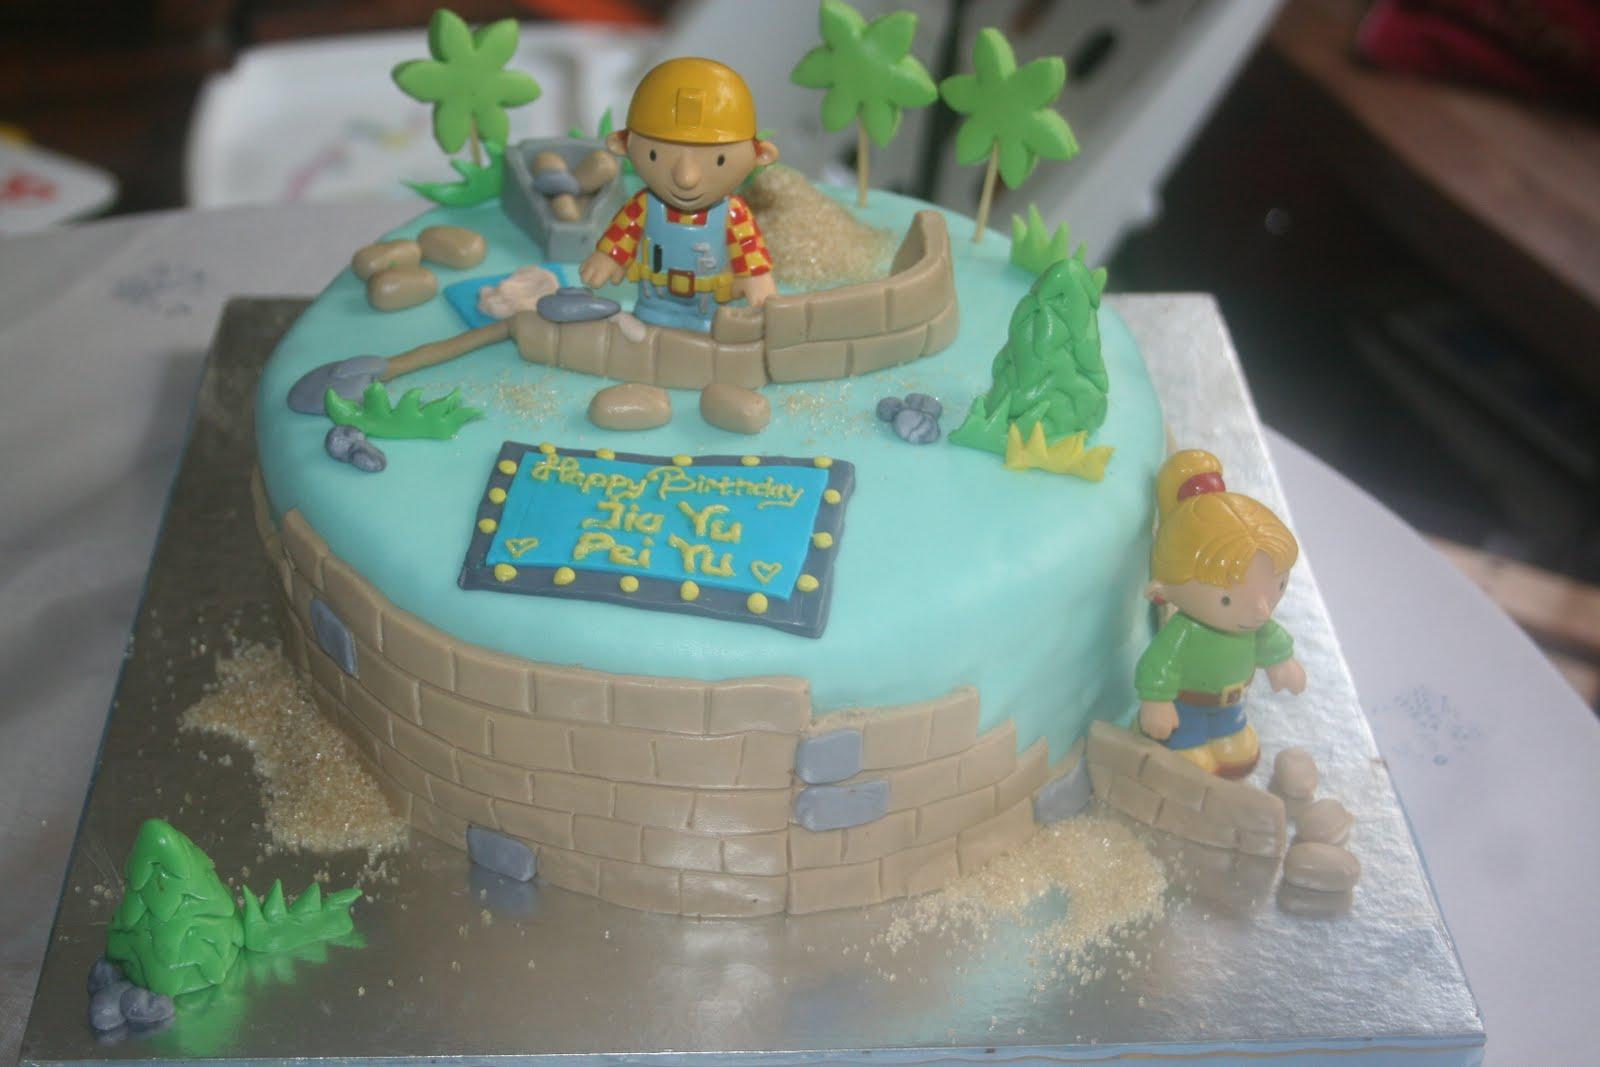 Butterfly Cake Bob The Builder Cake